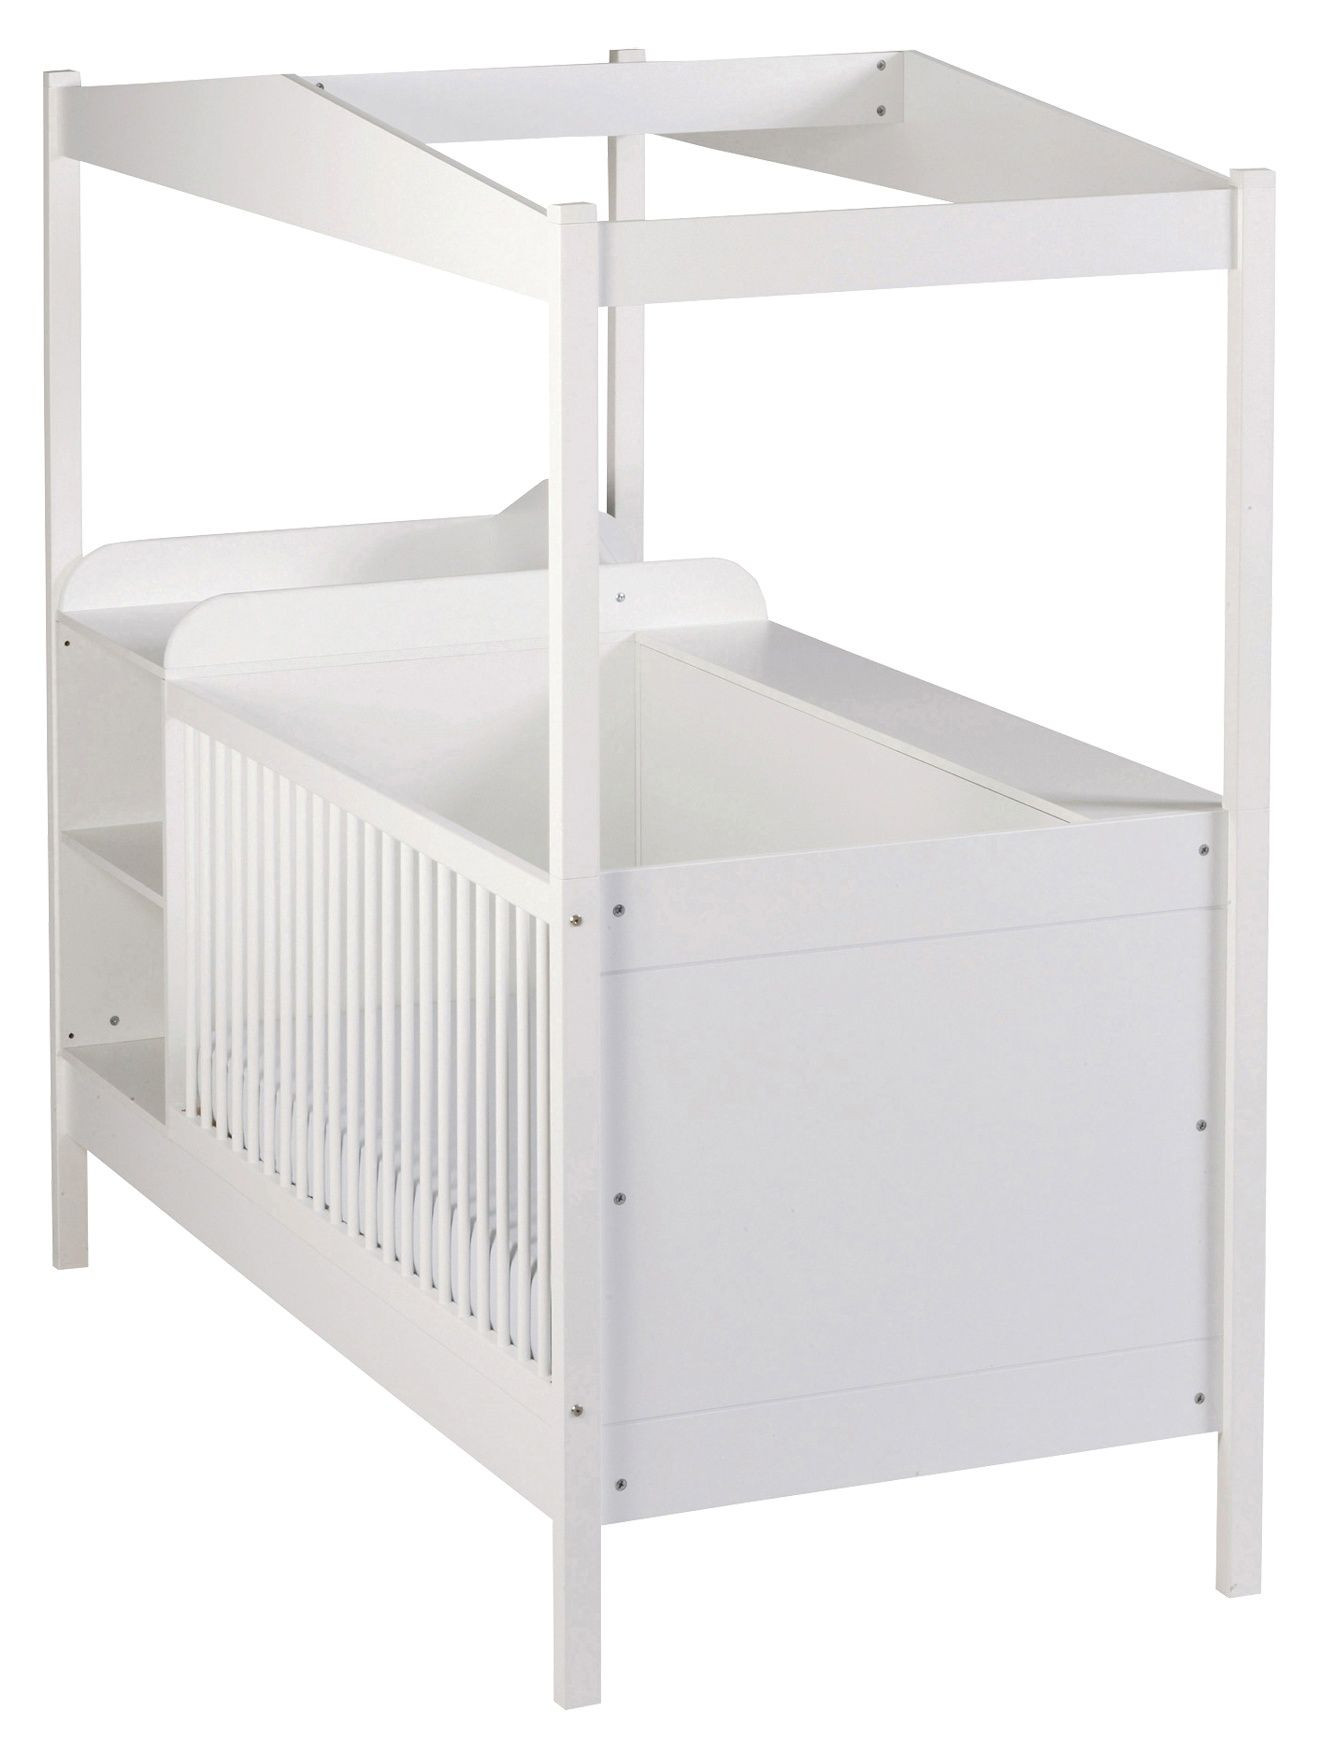 lit combin volutif archipel vertbaudet avis. Black Bedroom Furniture Sets. Home Design Ideas